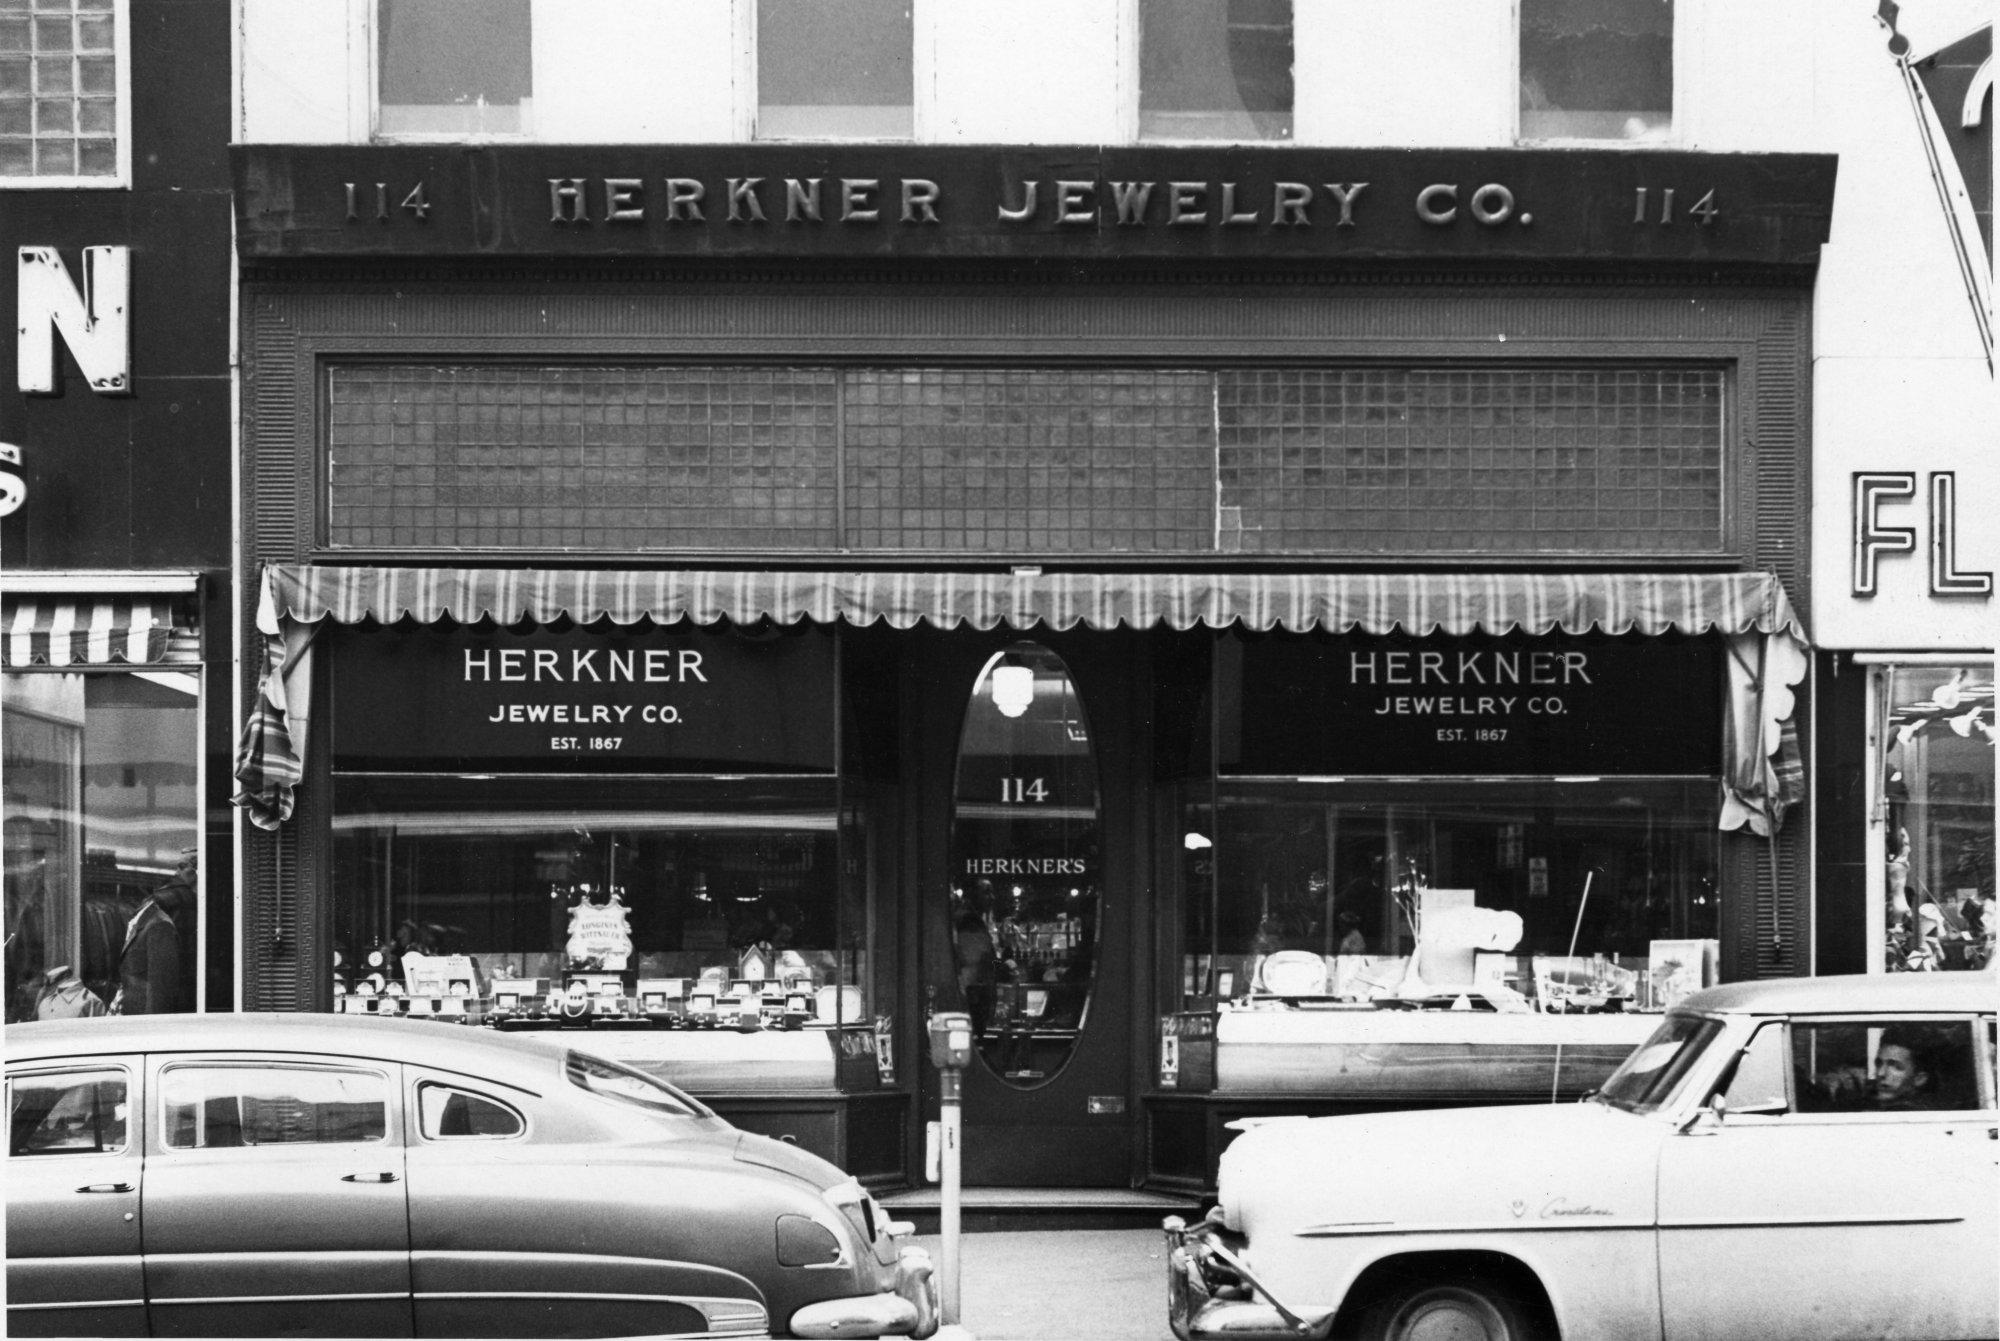 Herkner Jewelry 1950s History Grand Rapids